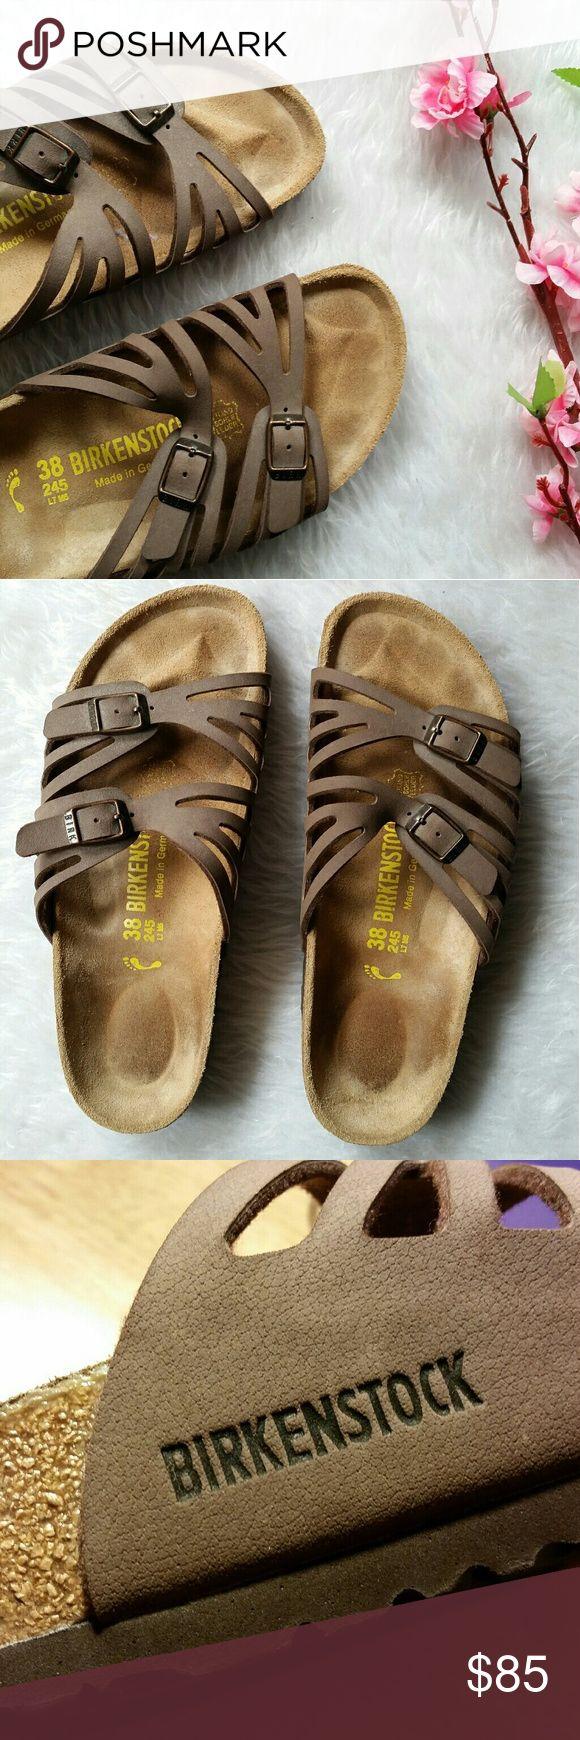 Best 25 Birkenstock Sandals Ideas On Pinterest